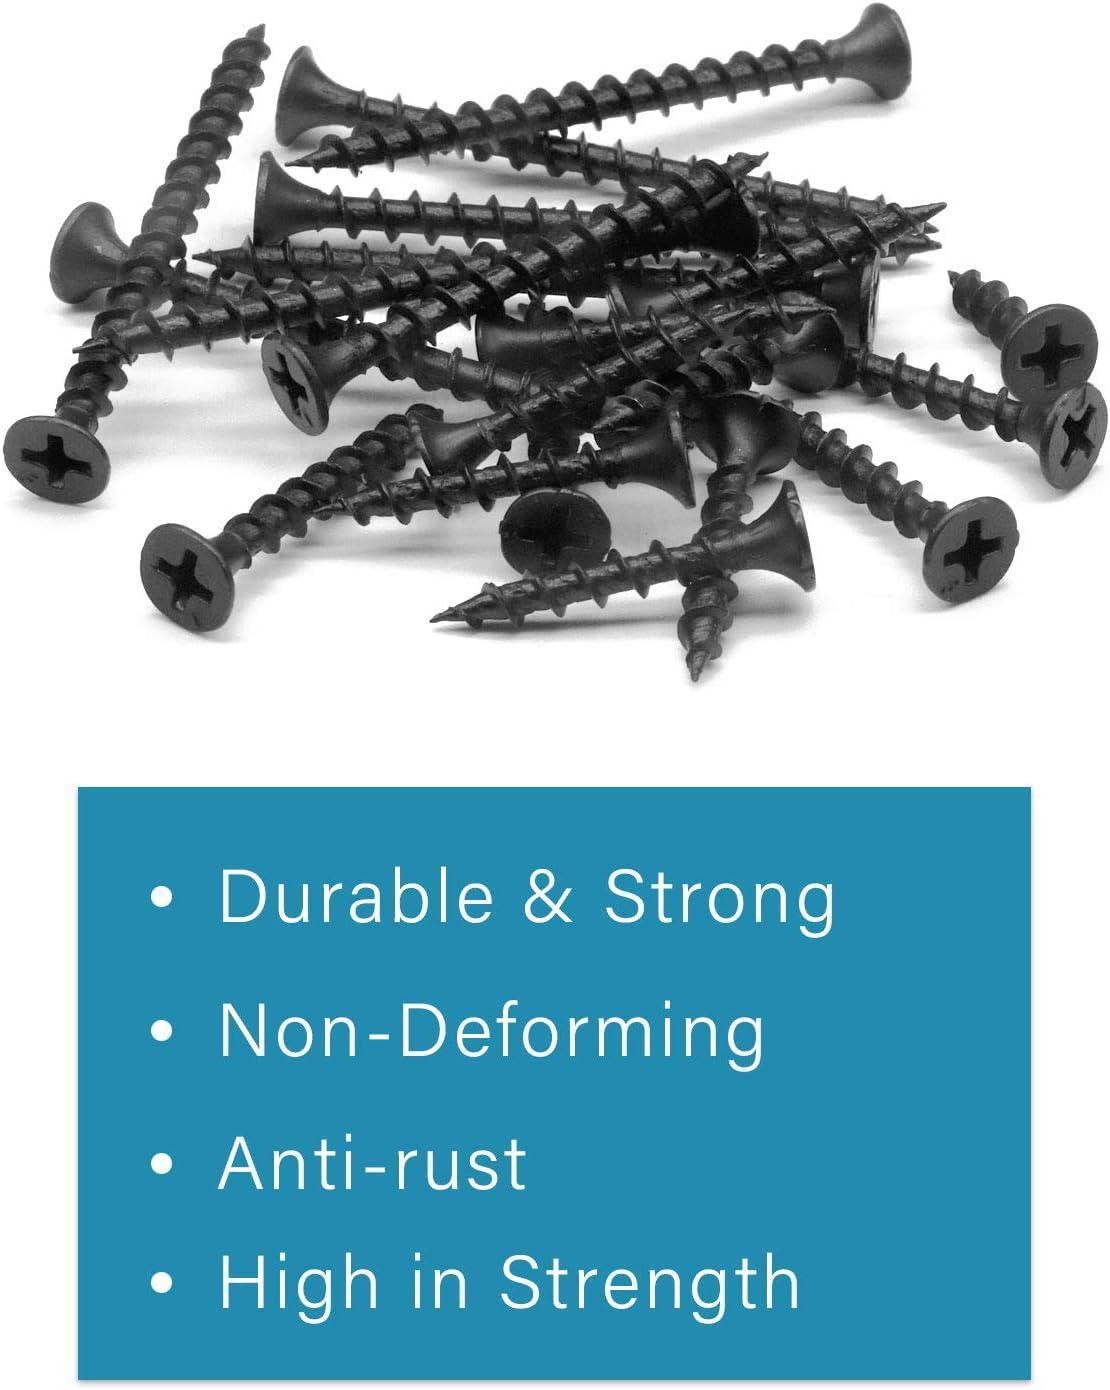 IMScrews 220pcs #7 Coarse Thread Drywall Screws with Phillips Drive Black Oxide Bugle Head Self Drilling Wood Screws Assortment Kit Ideal for Drywall Sheetrock